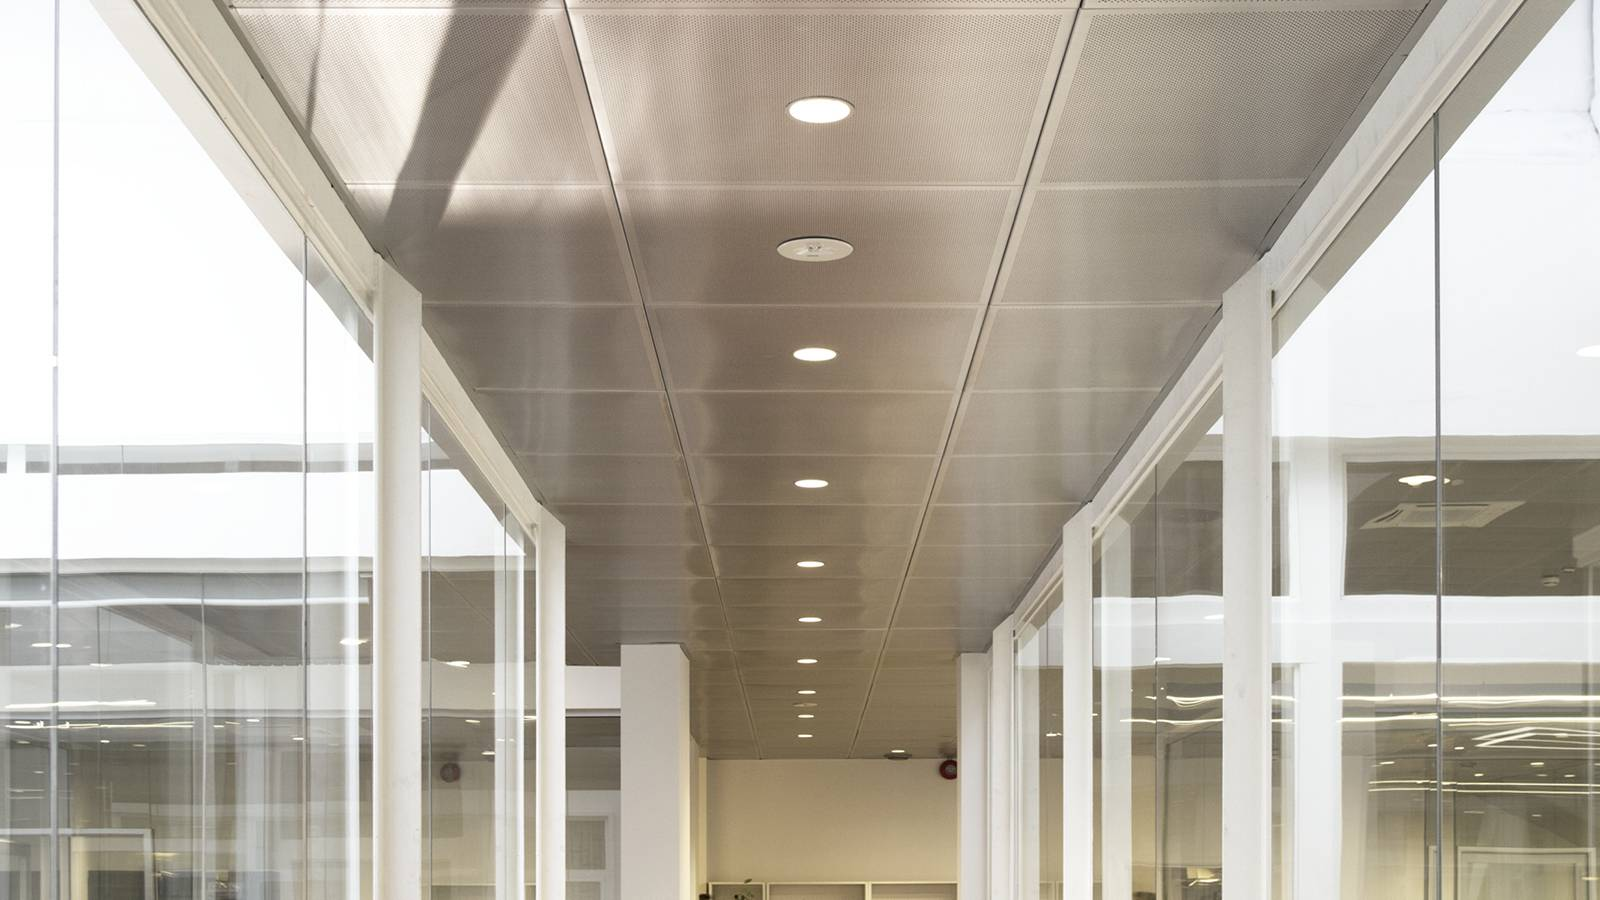 BRIDGE ACROSS THE ATRIUM - Frontline Offices - SPOL Architects